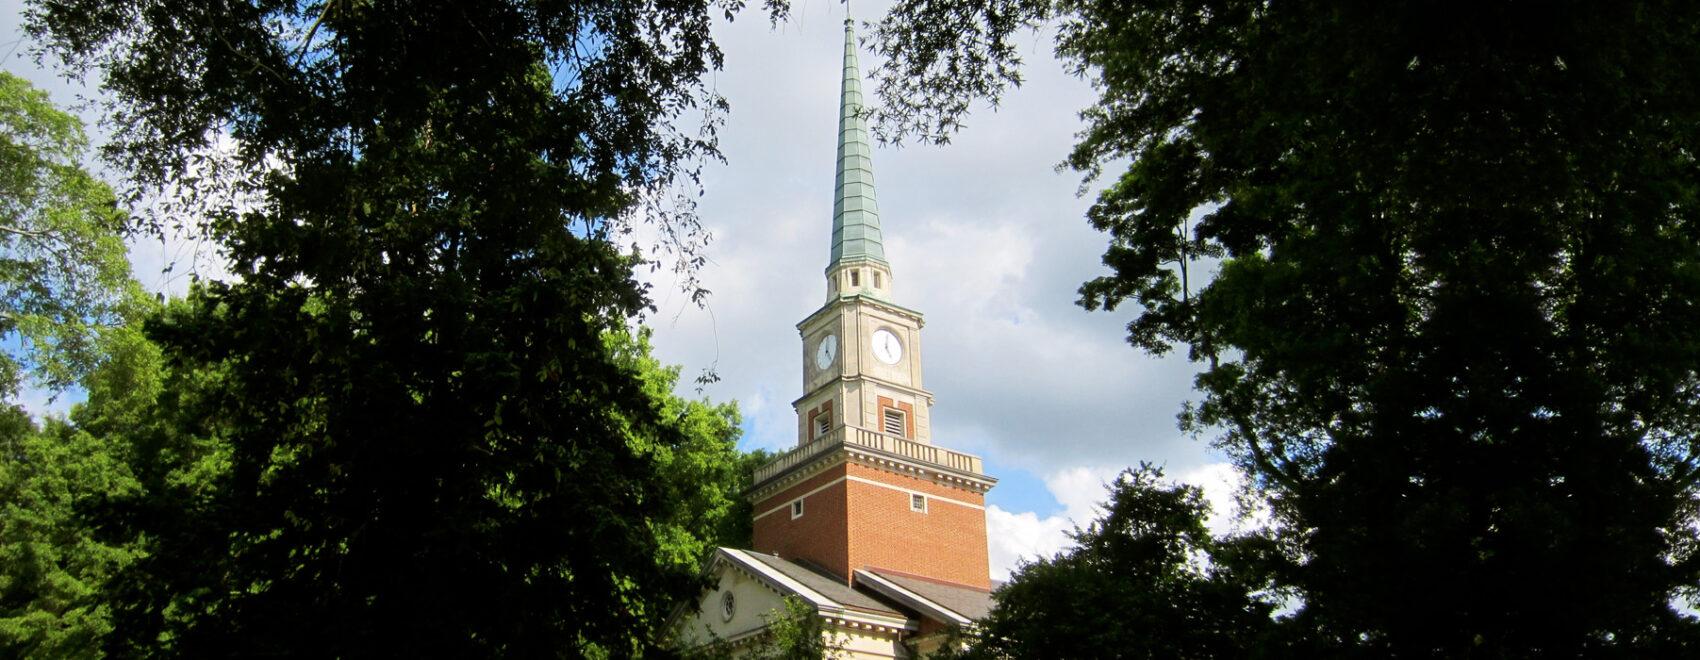 Church steeple at Davidson College